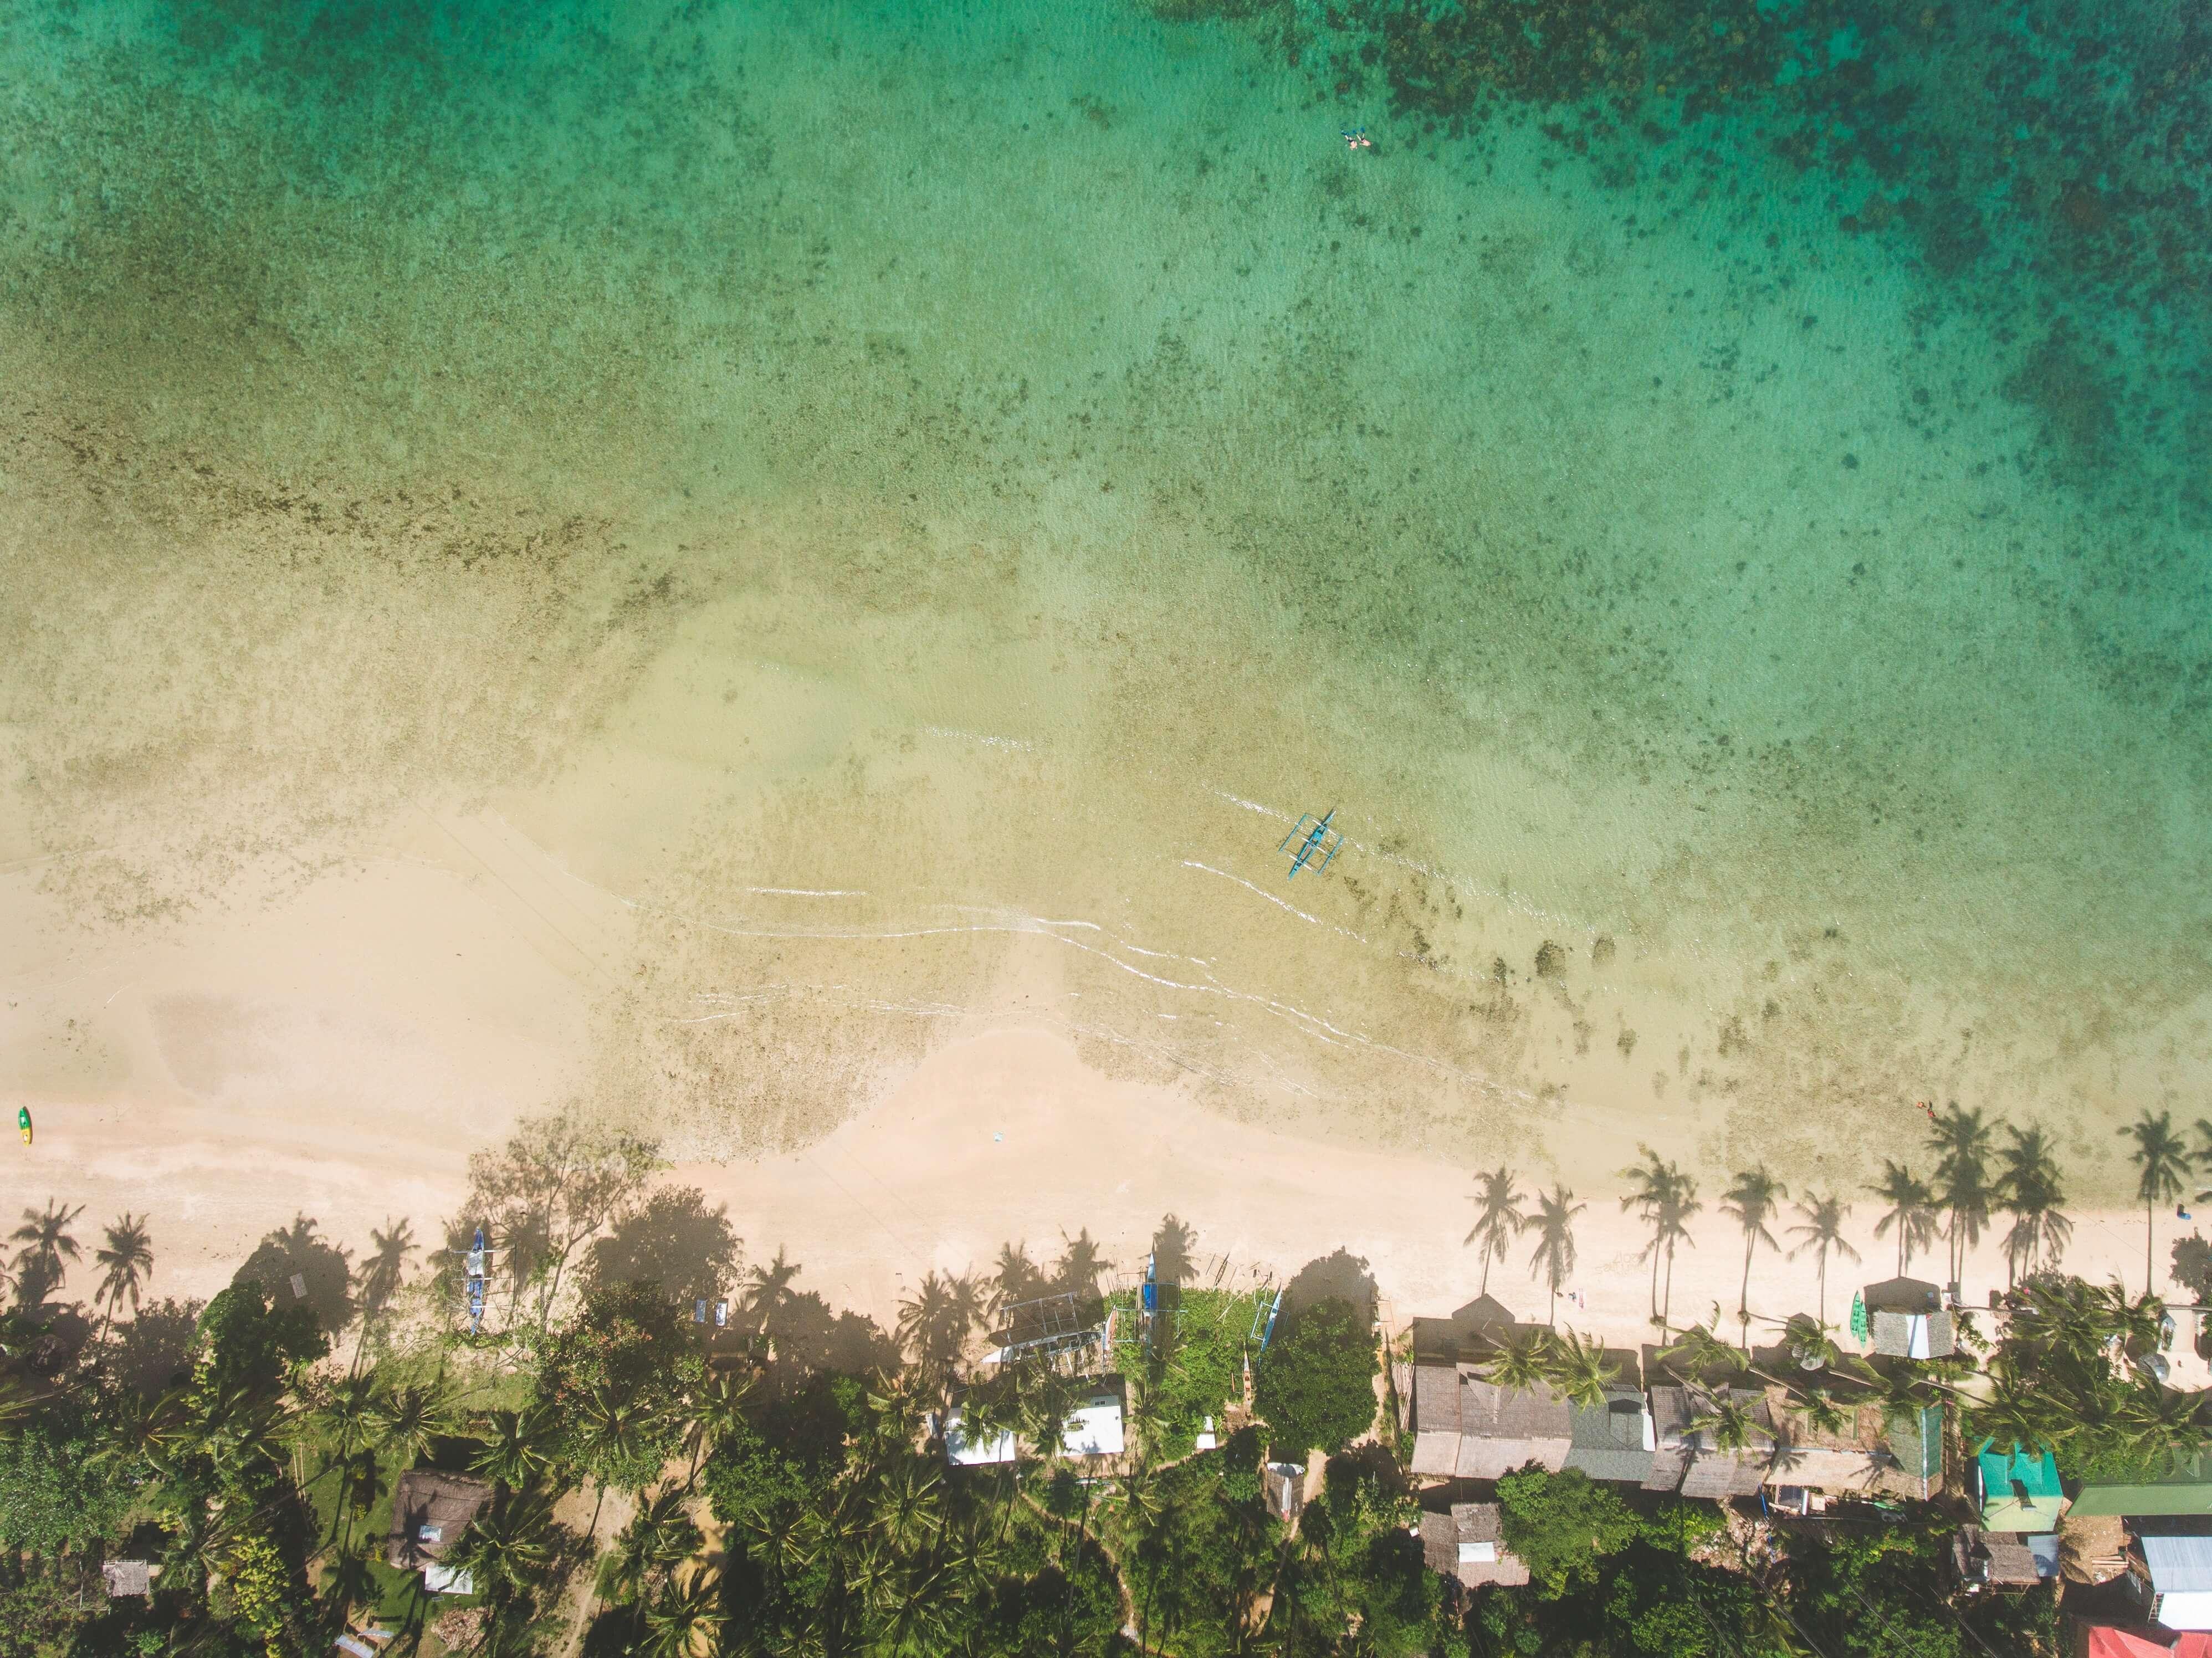 Nagtabon Beach, Palawan Island